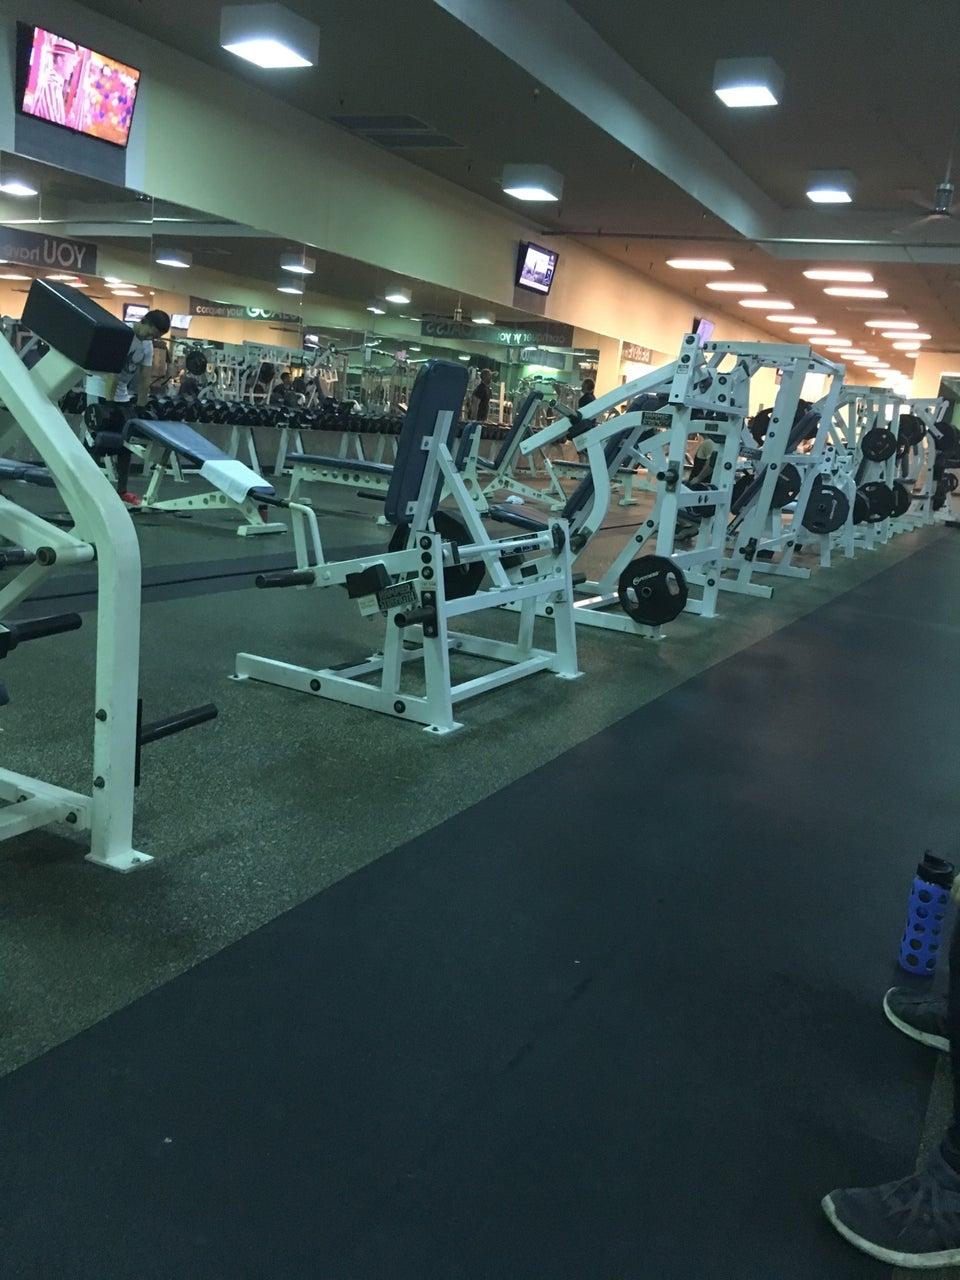 24 Hour Fitness Bellflower : fitness, bellflower, Fitness, Beach, Reviews,, Photos, Altos, GayCities